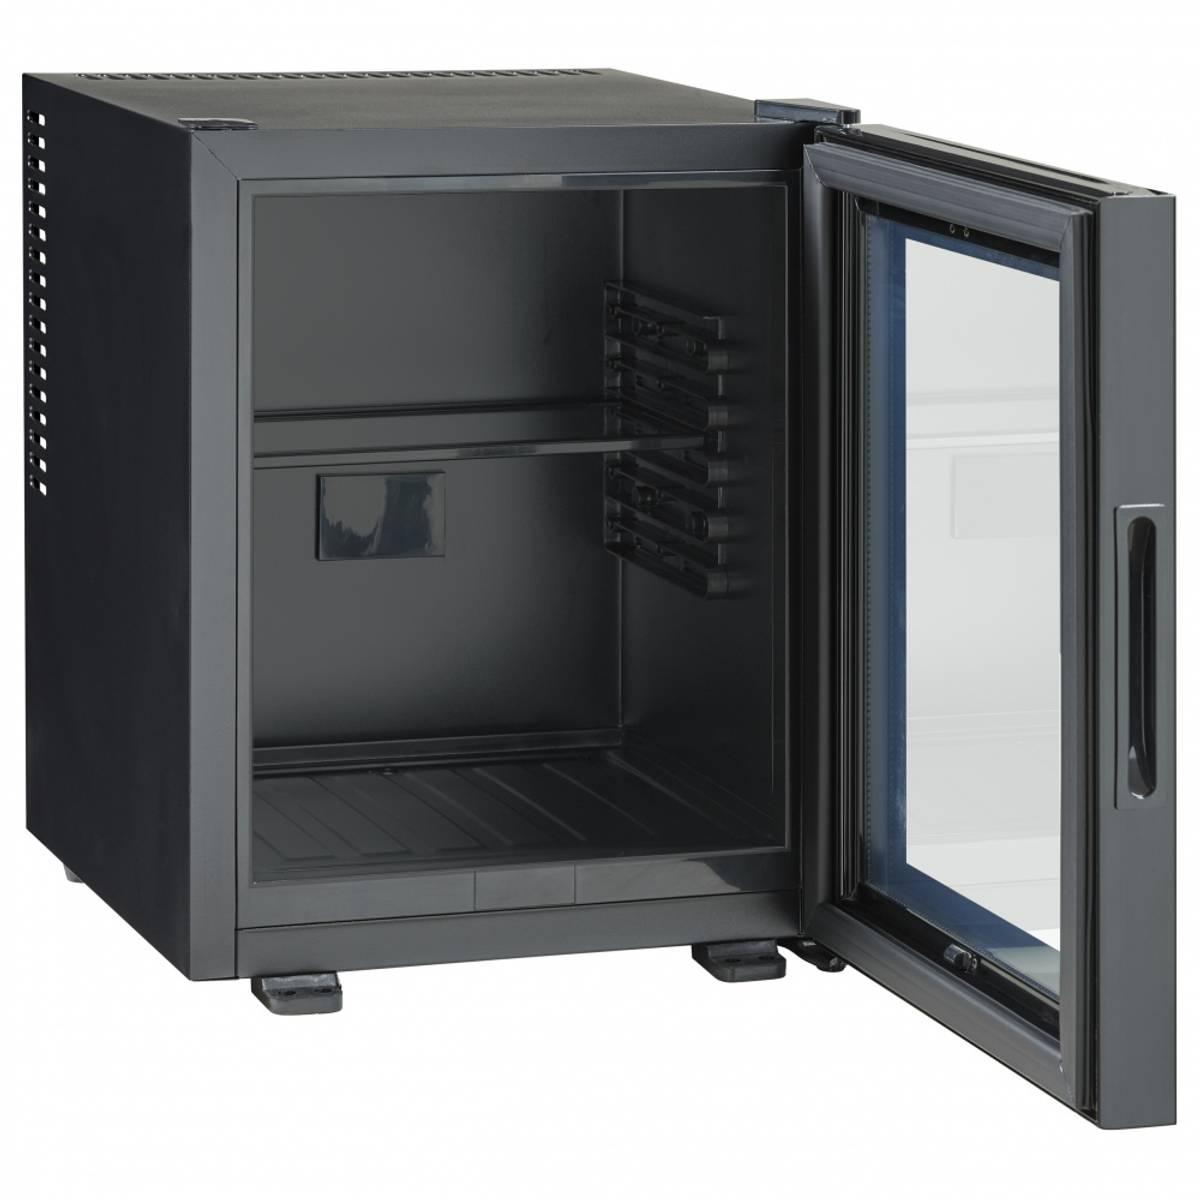 Scandomestic kjøleskap displaysvart 35 liter MB 32 BGD